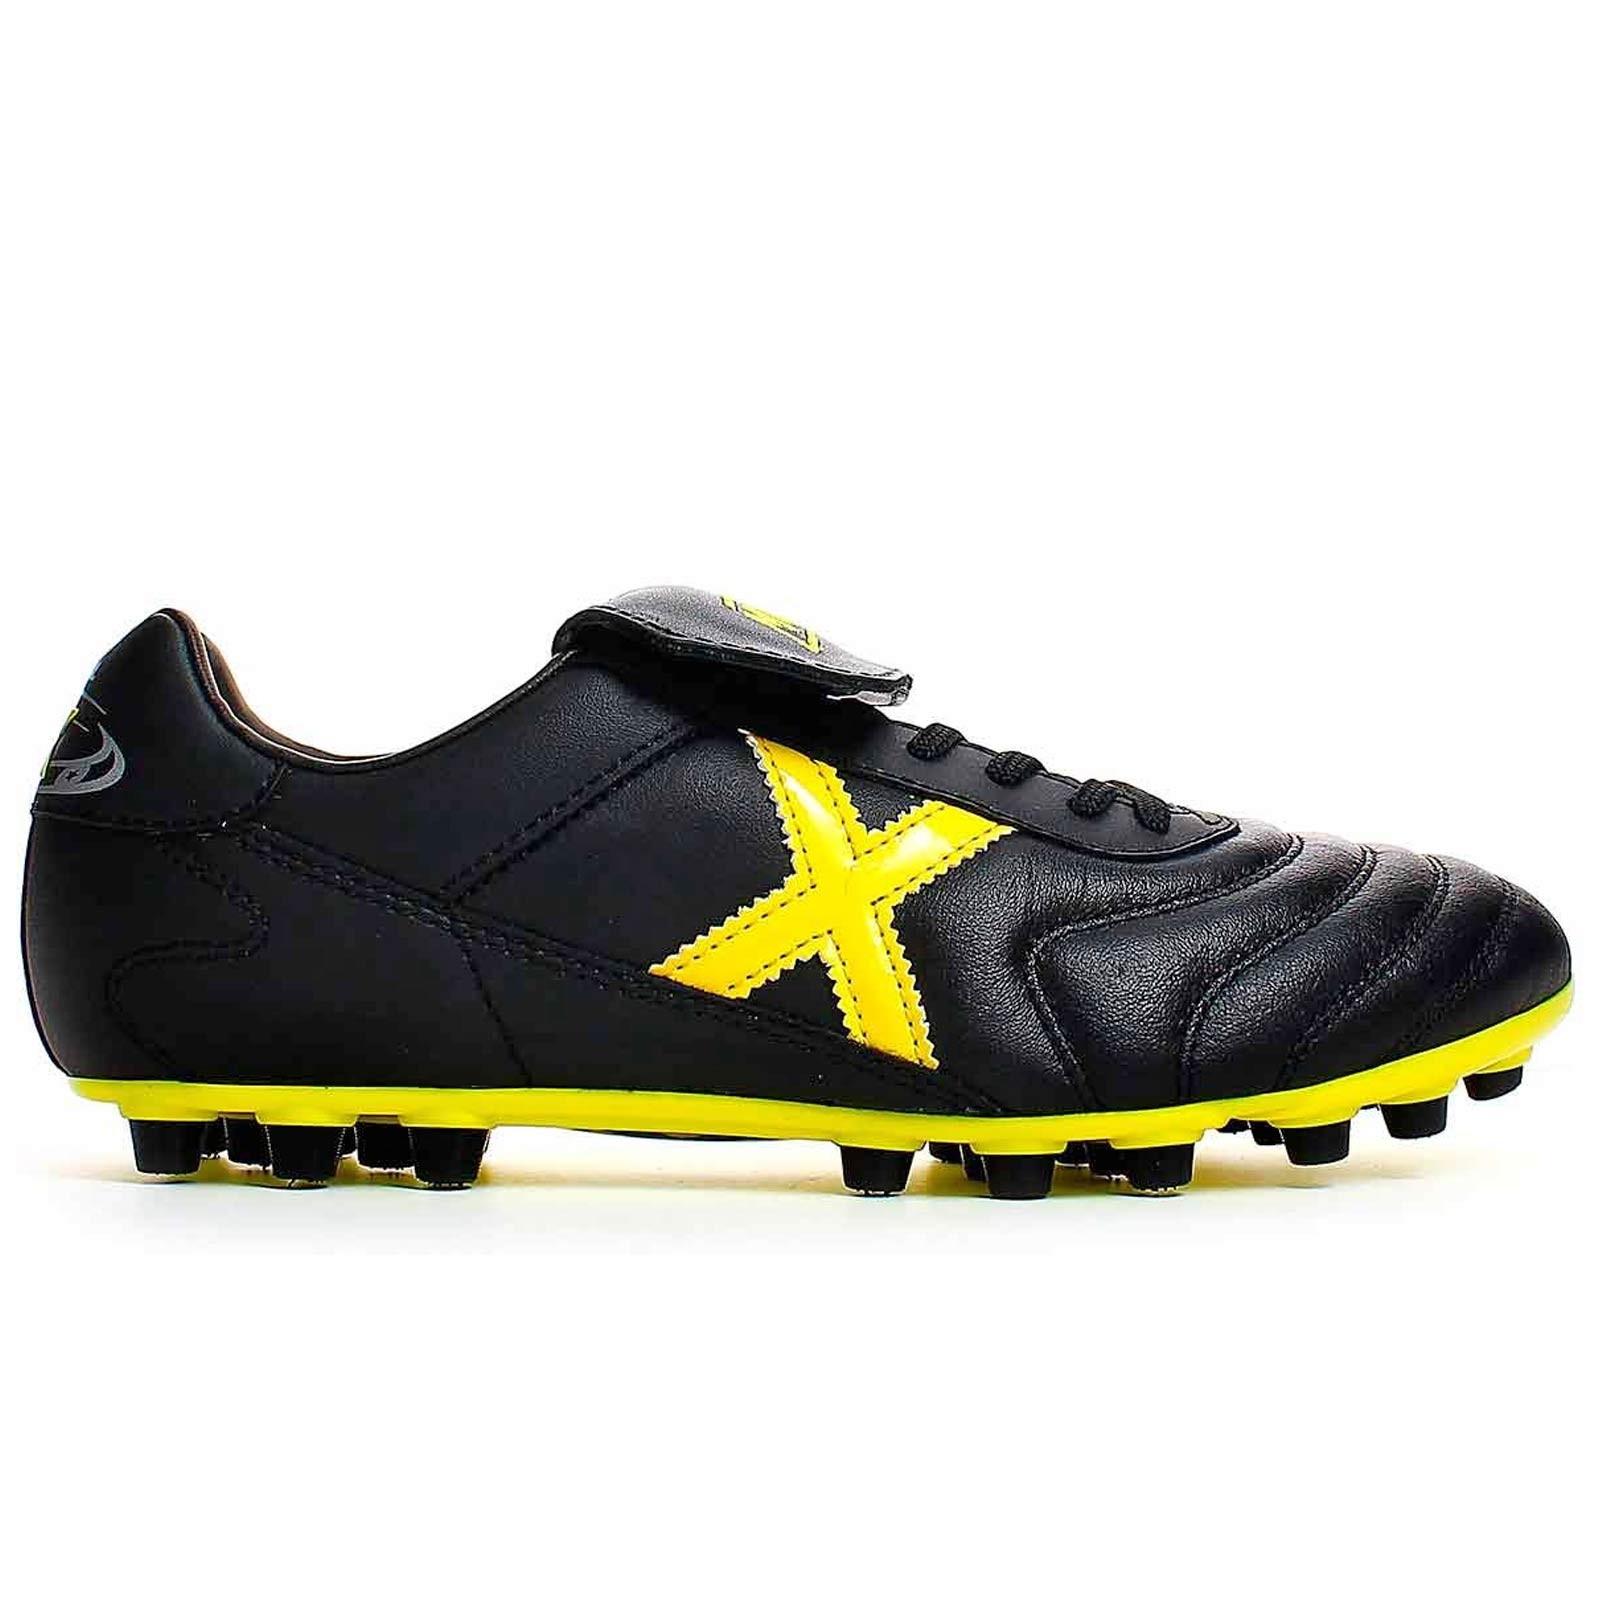 Botas Munich Mundial U25 negro - amarillo  5b6a24060285c